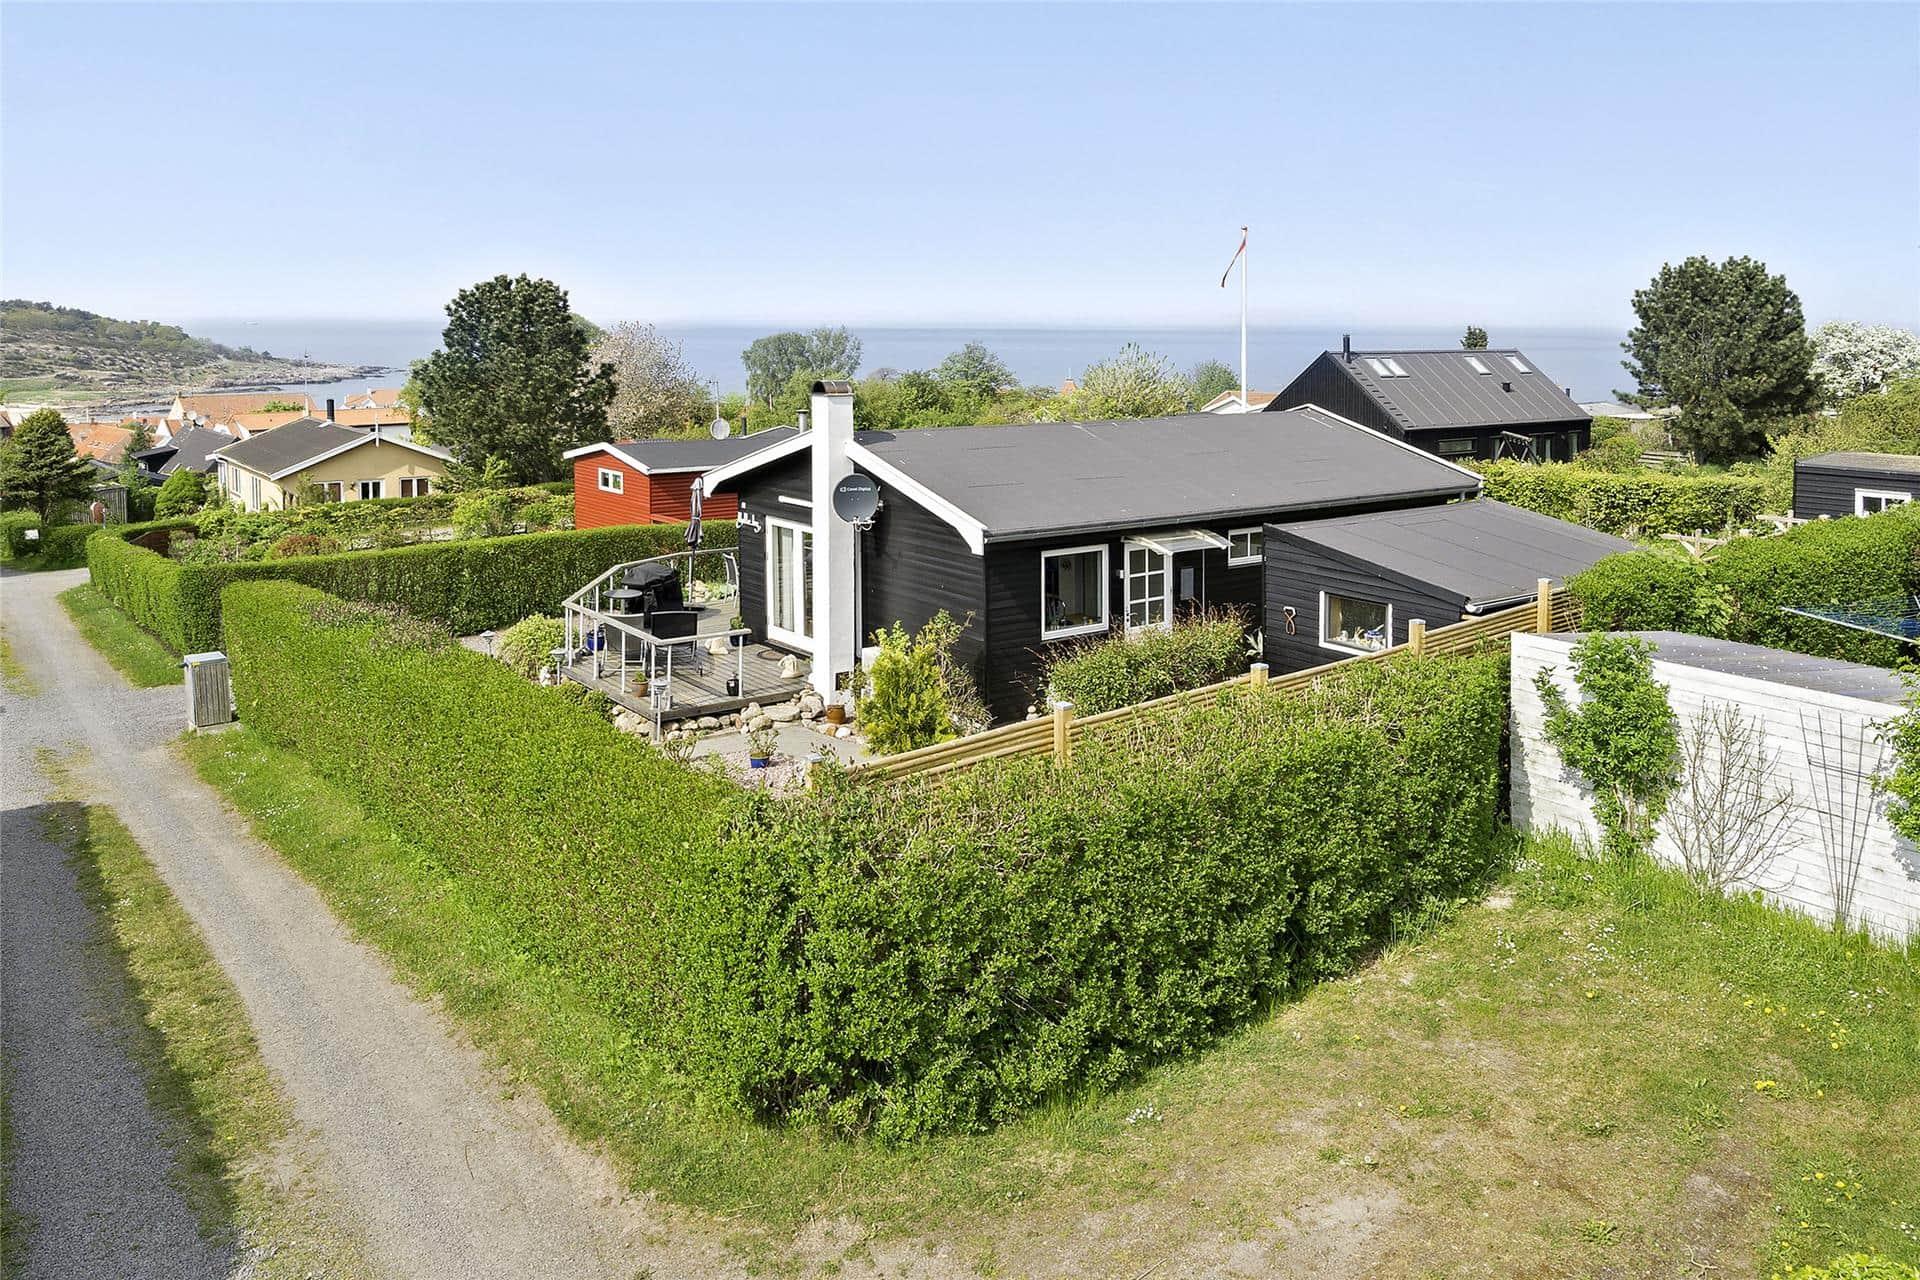 Billede 1-10 Sommerhus 6772, Krølle Bøllevej 13, DK - 3770 Allinge